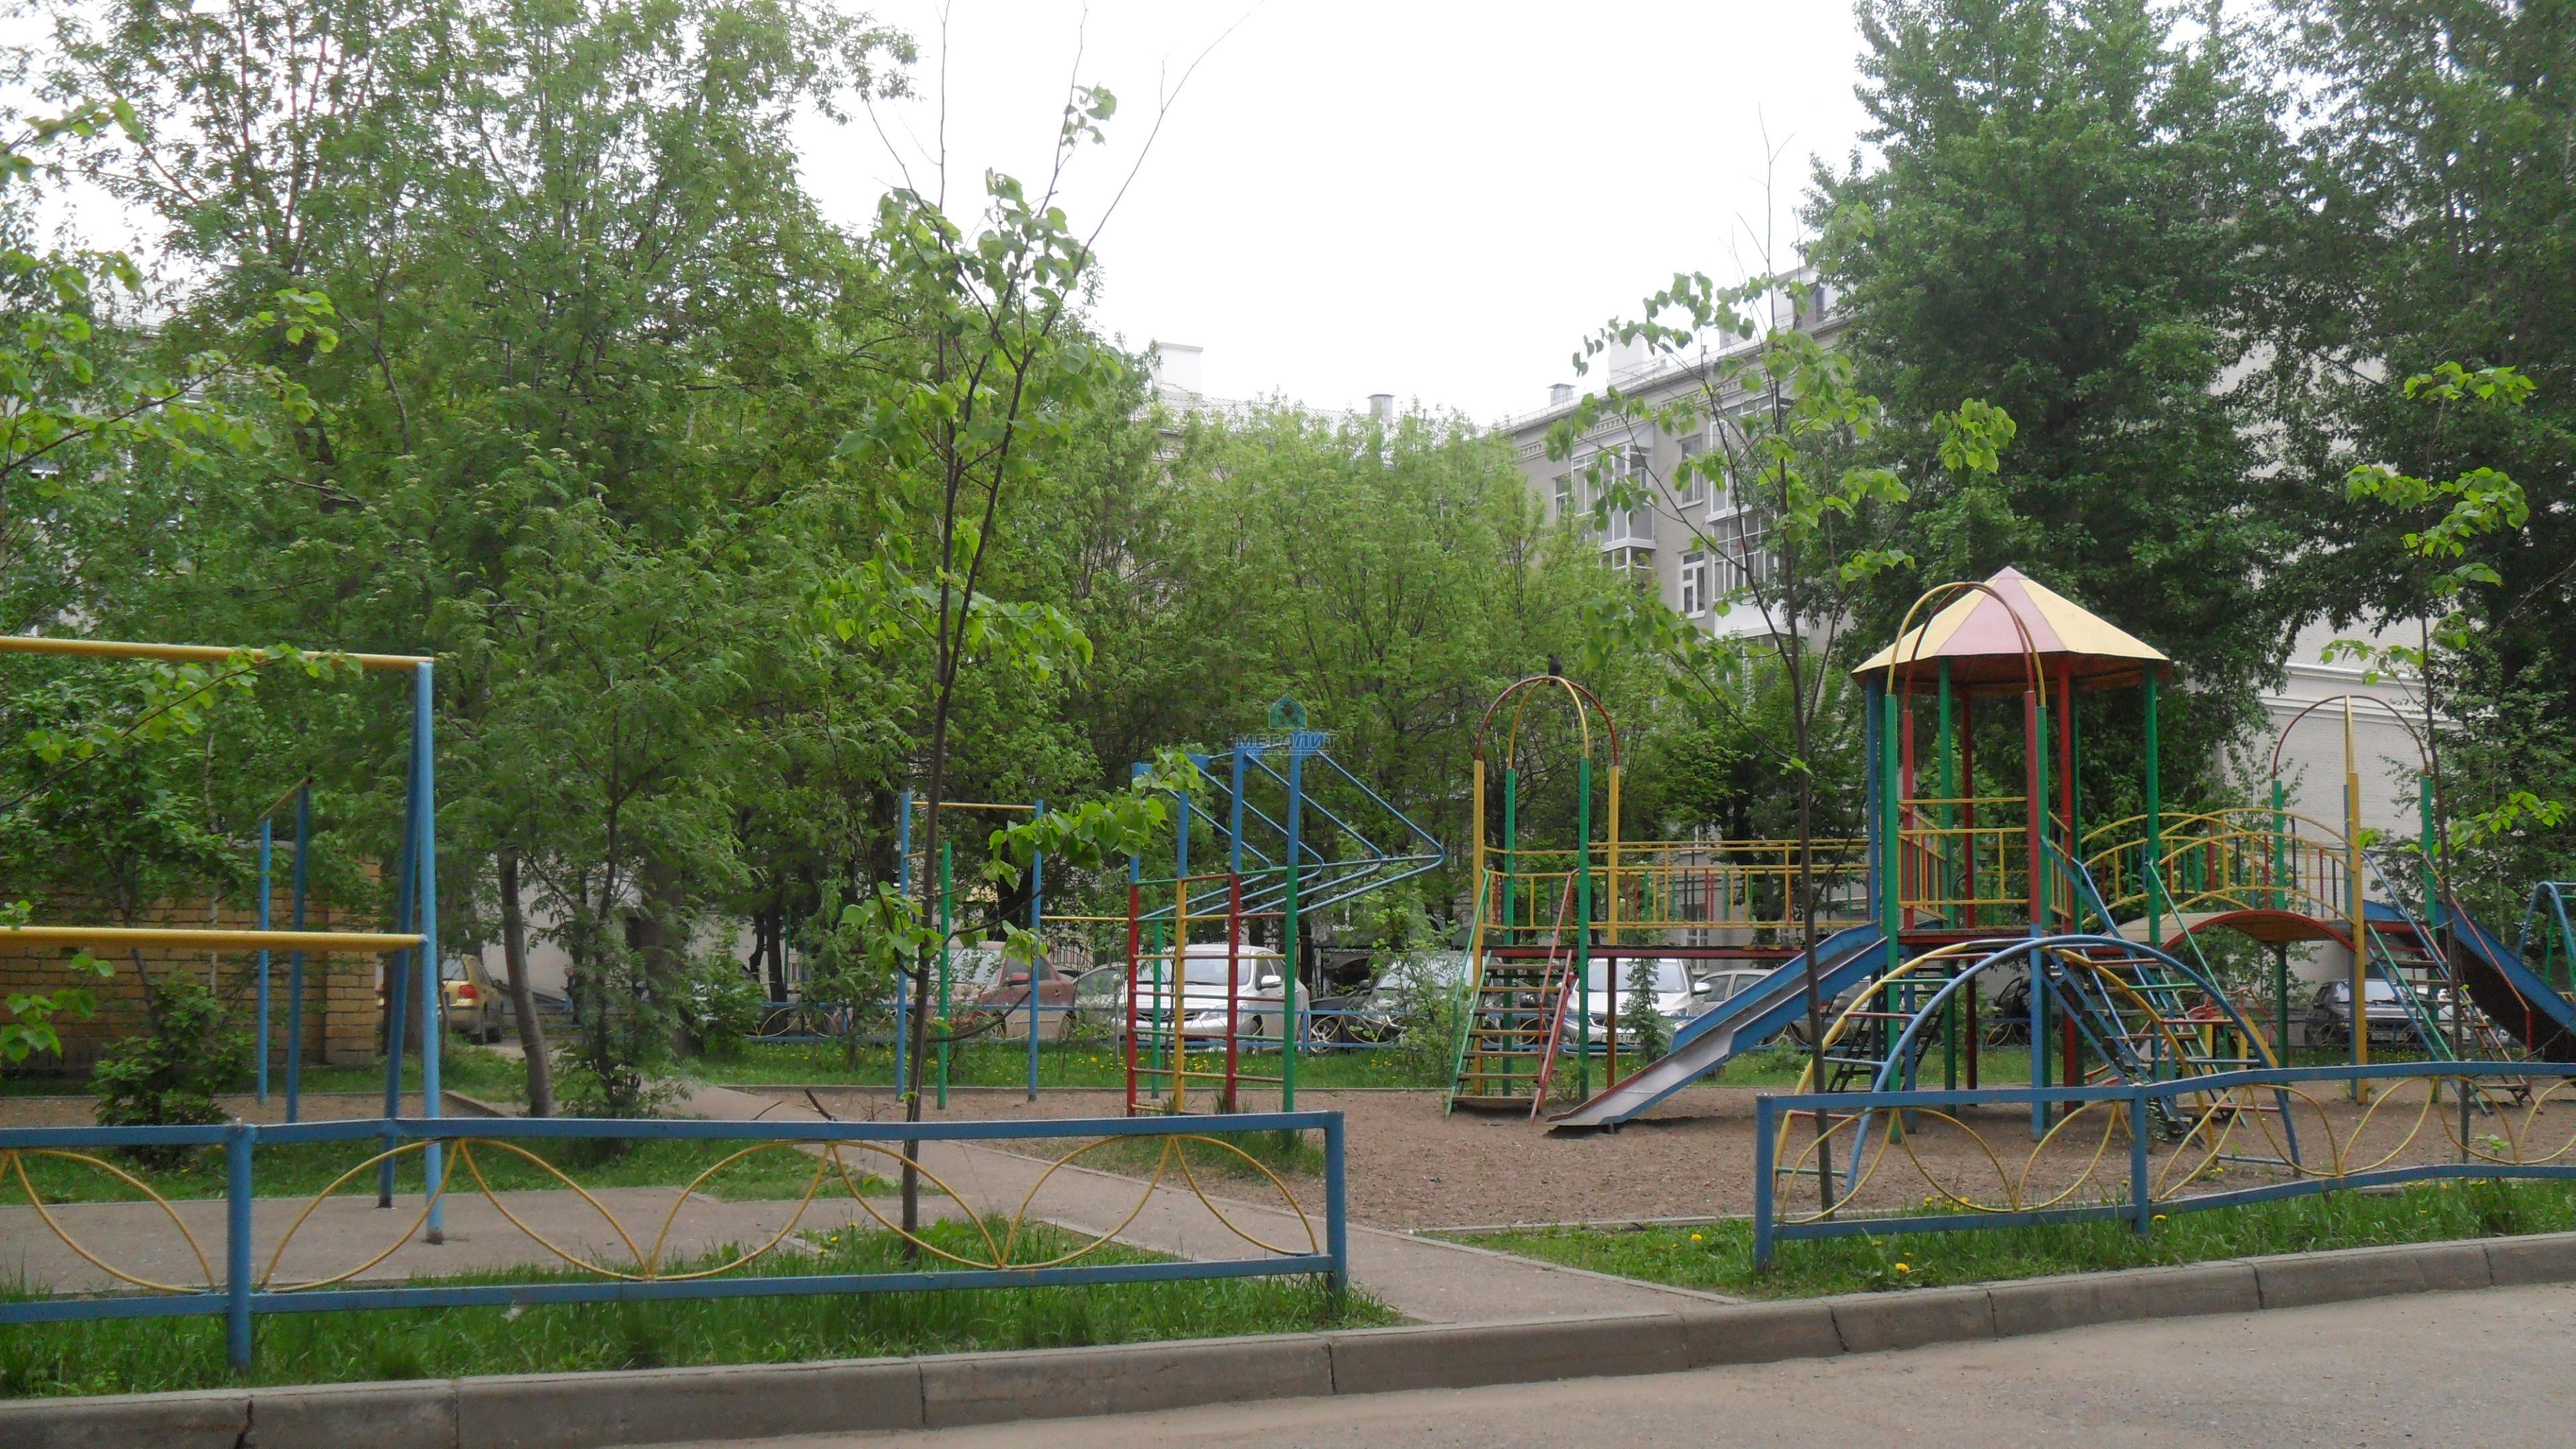 Продам 1-комнатную квартиру за 1,45 млн. руб. (миниатюра №10)